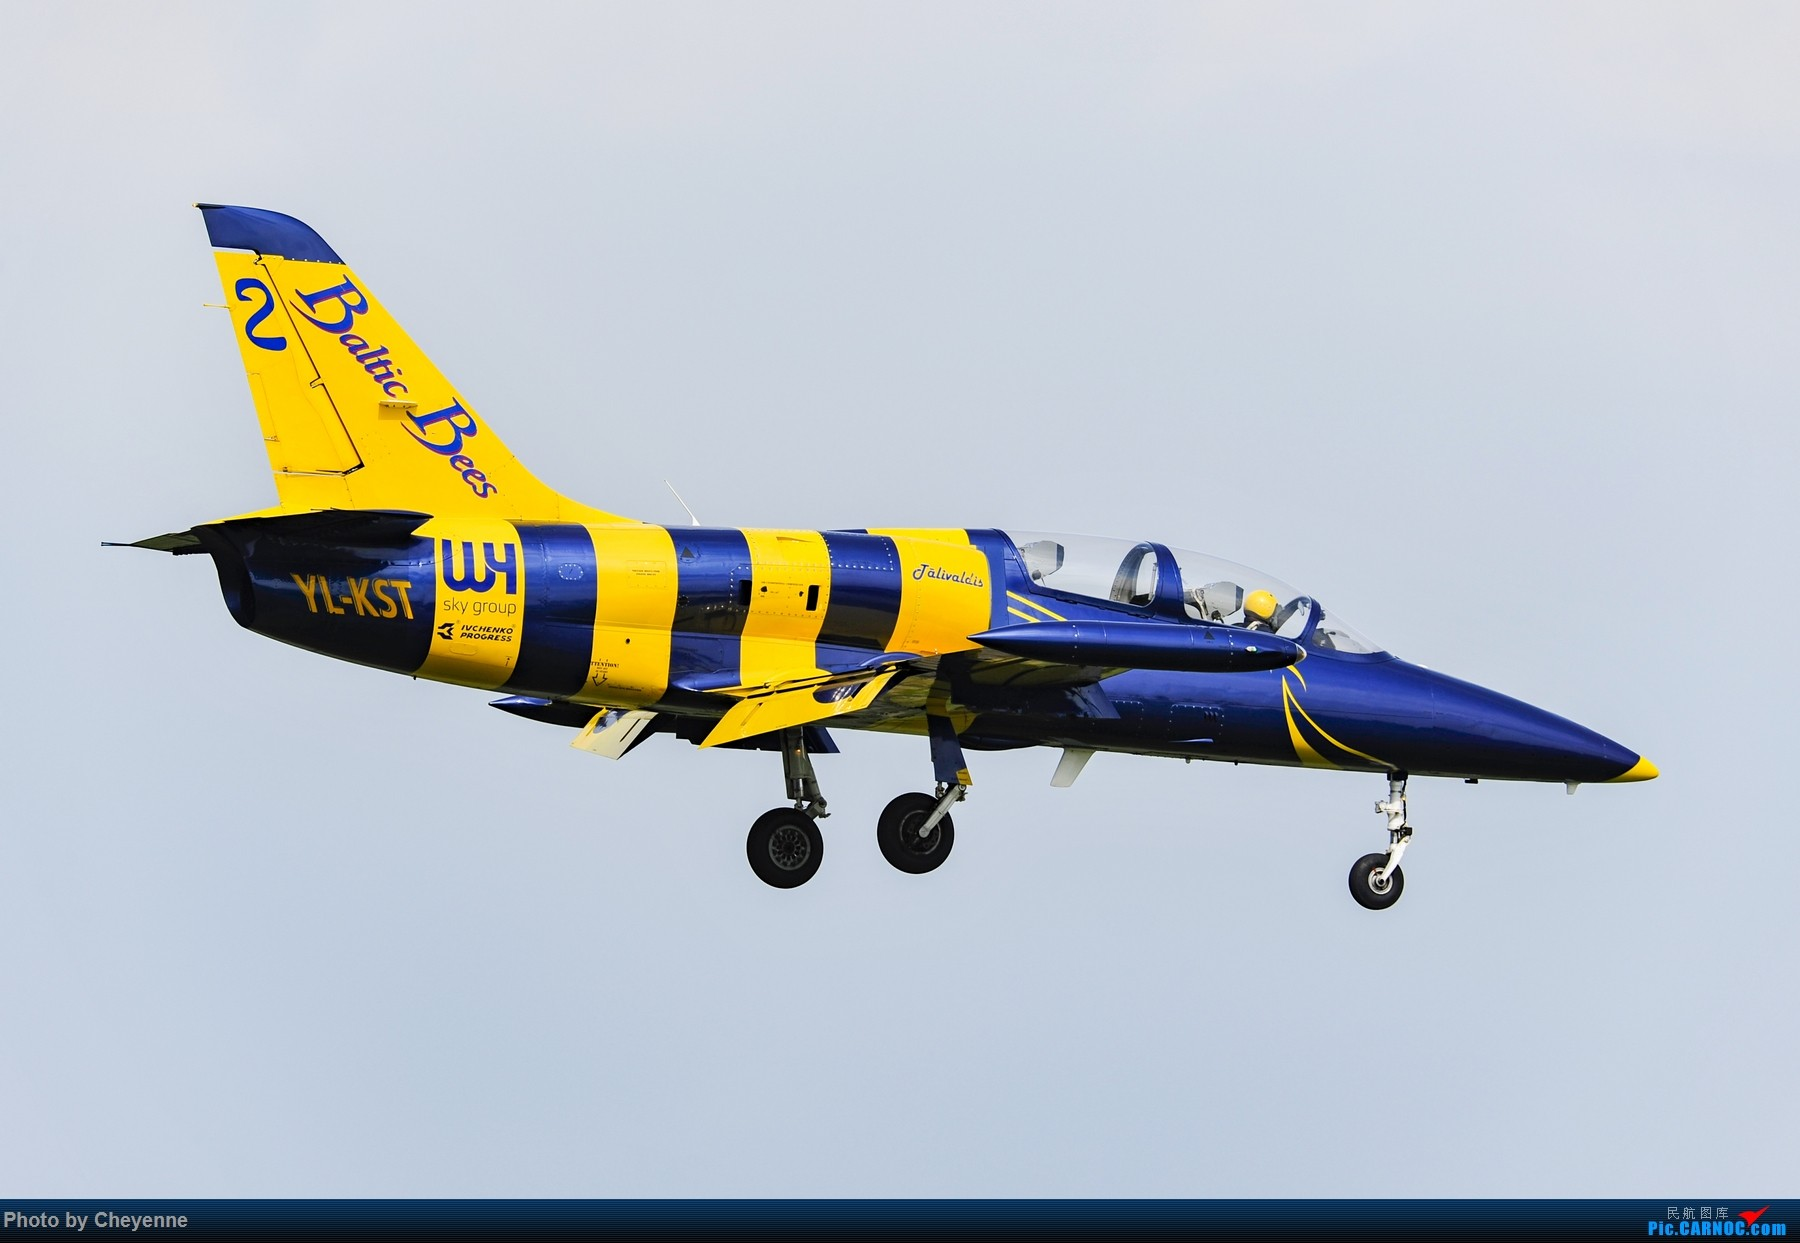 Re:[原创]外面遛遛就好,瞅瞅可爱的华约小蜜蜂 AERO L-39C ALBATROS YL-KST 中国广汉机场